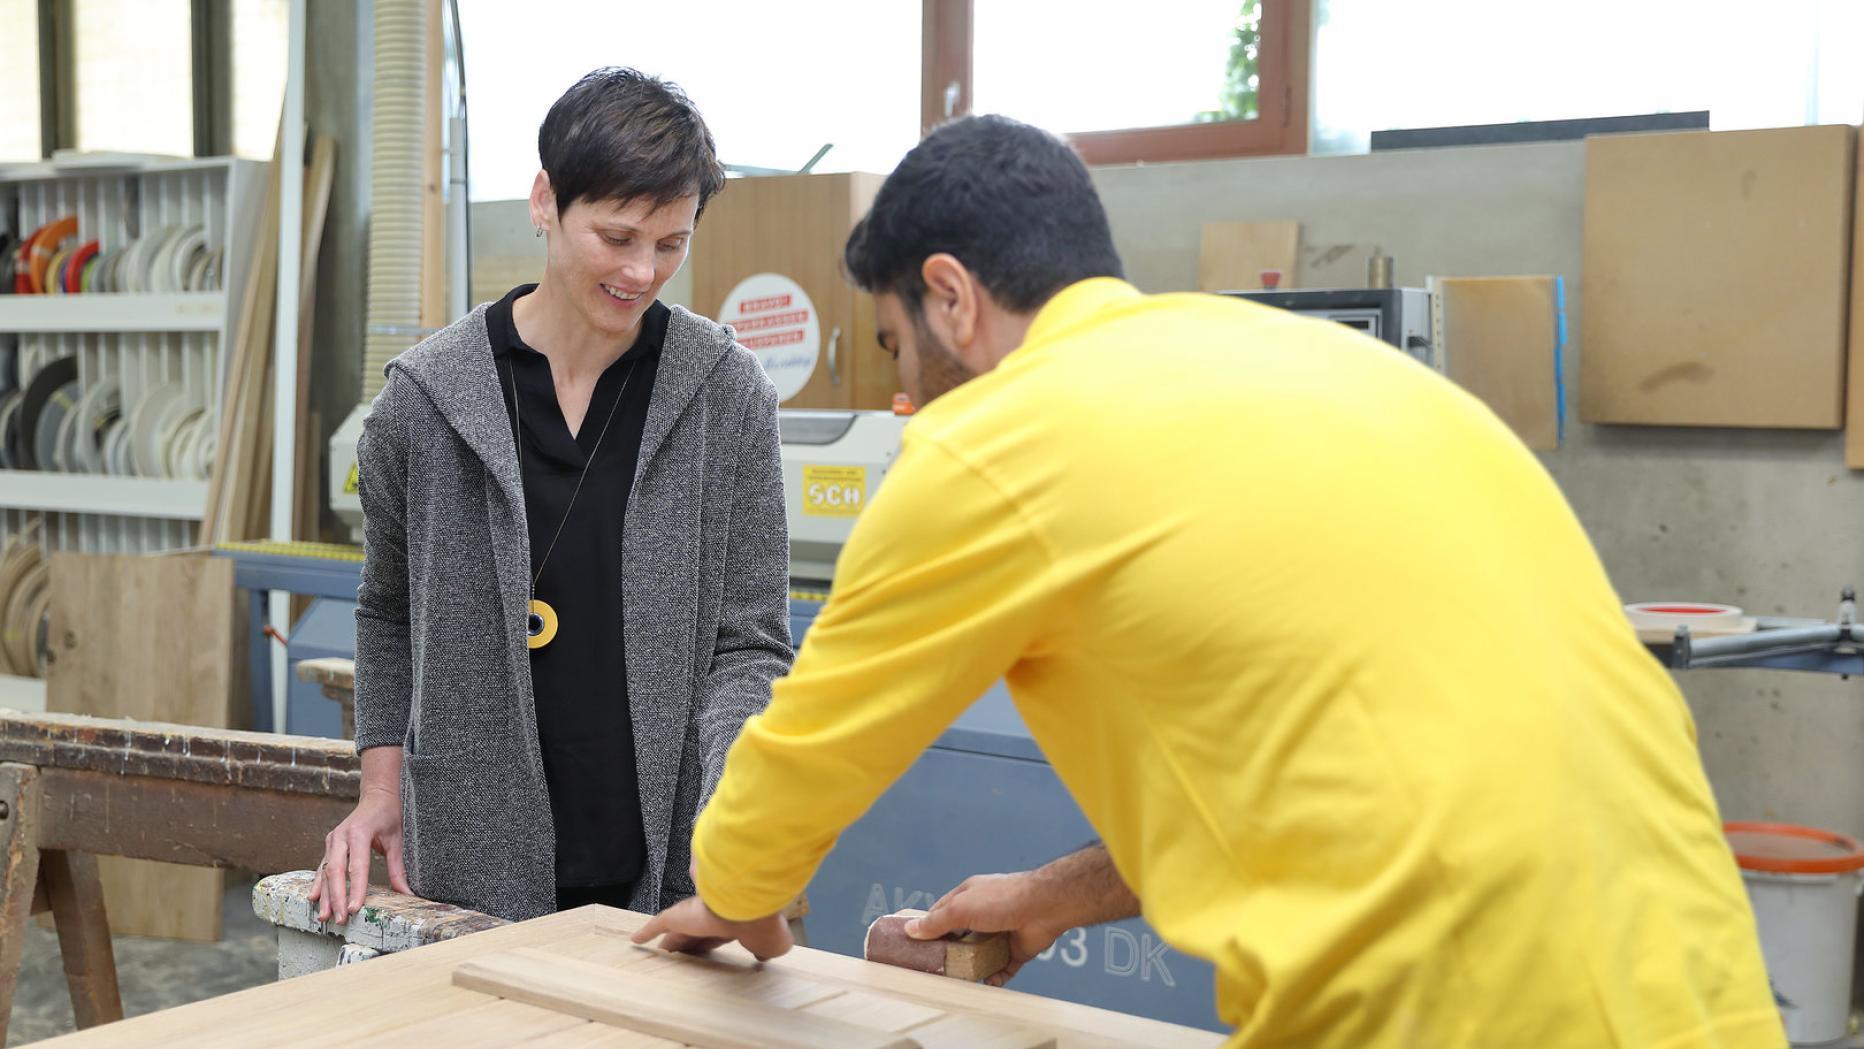 Dating app aus feldkirchen an der donau: Ehrenhausen an der